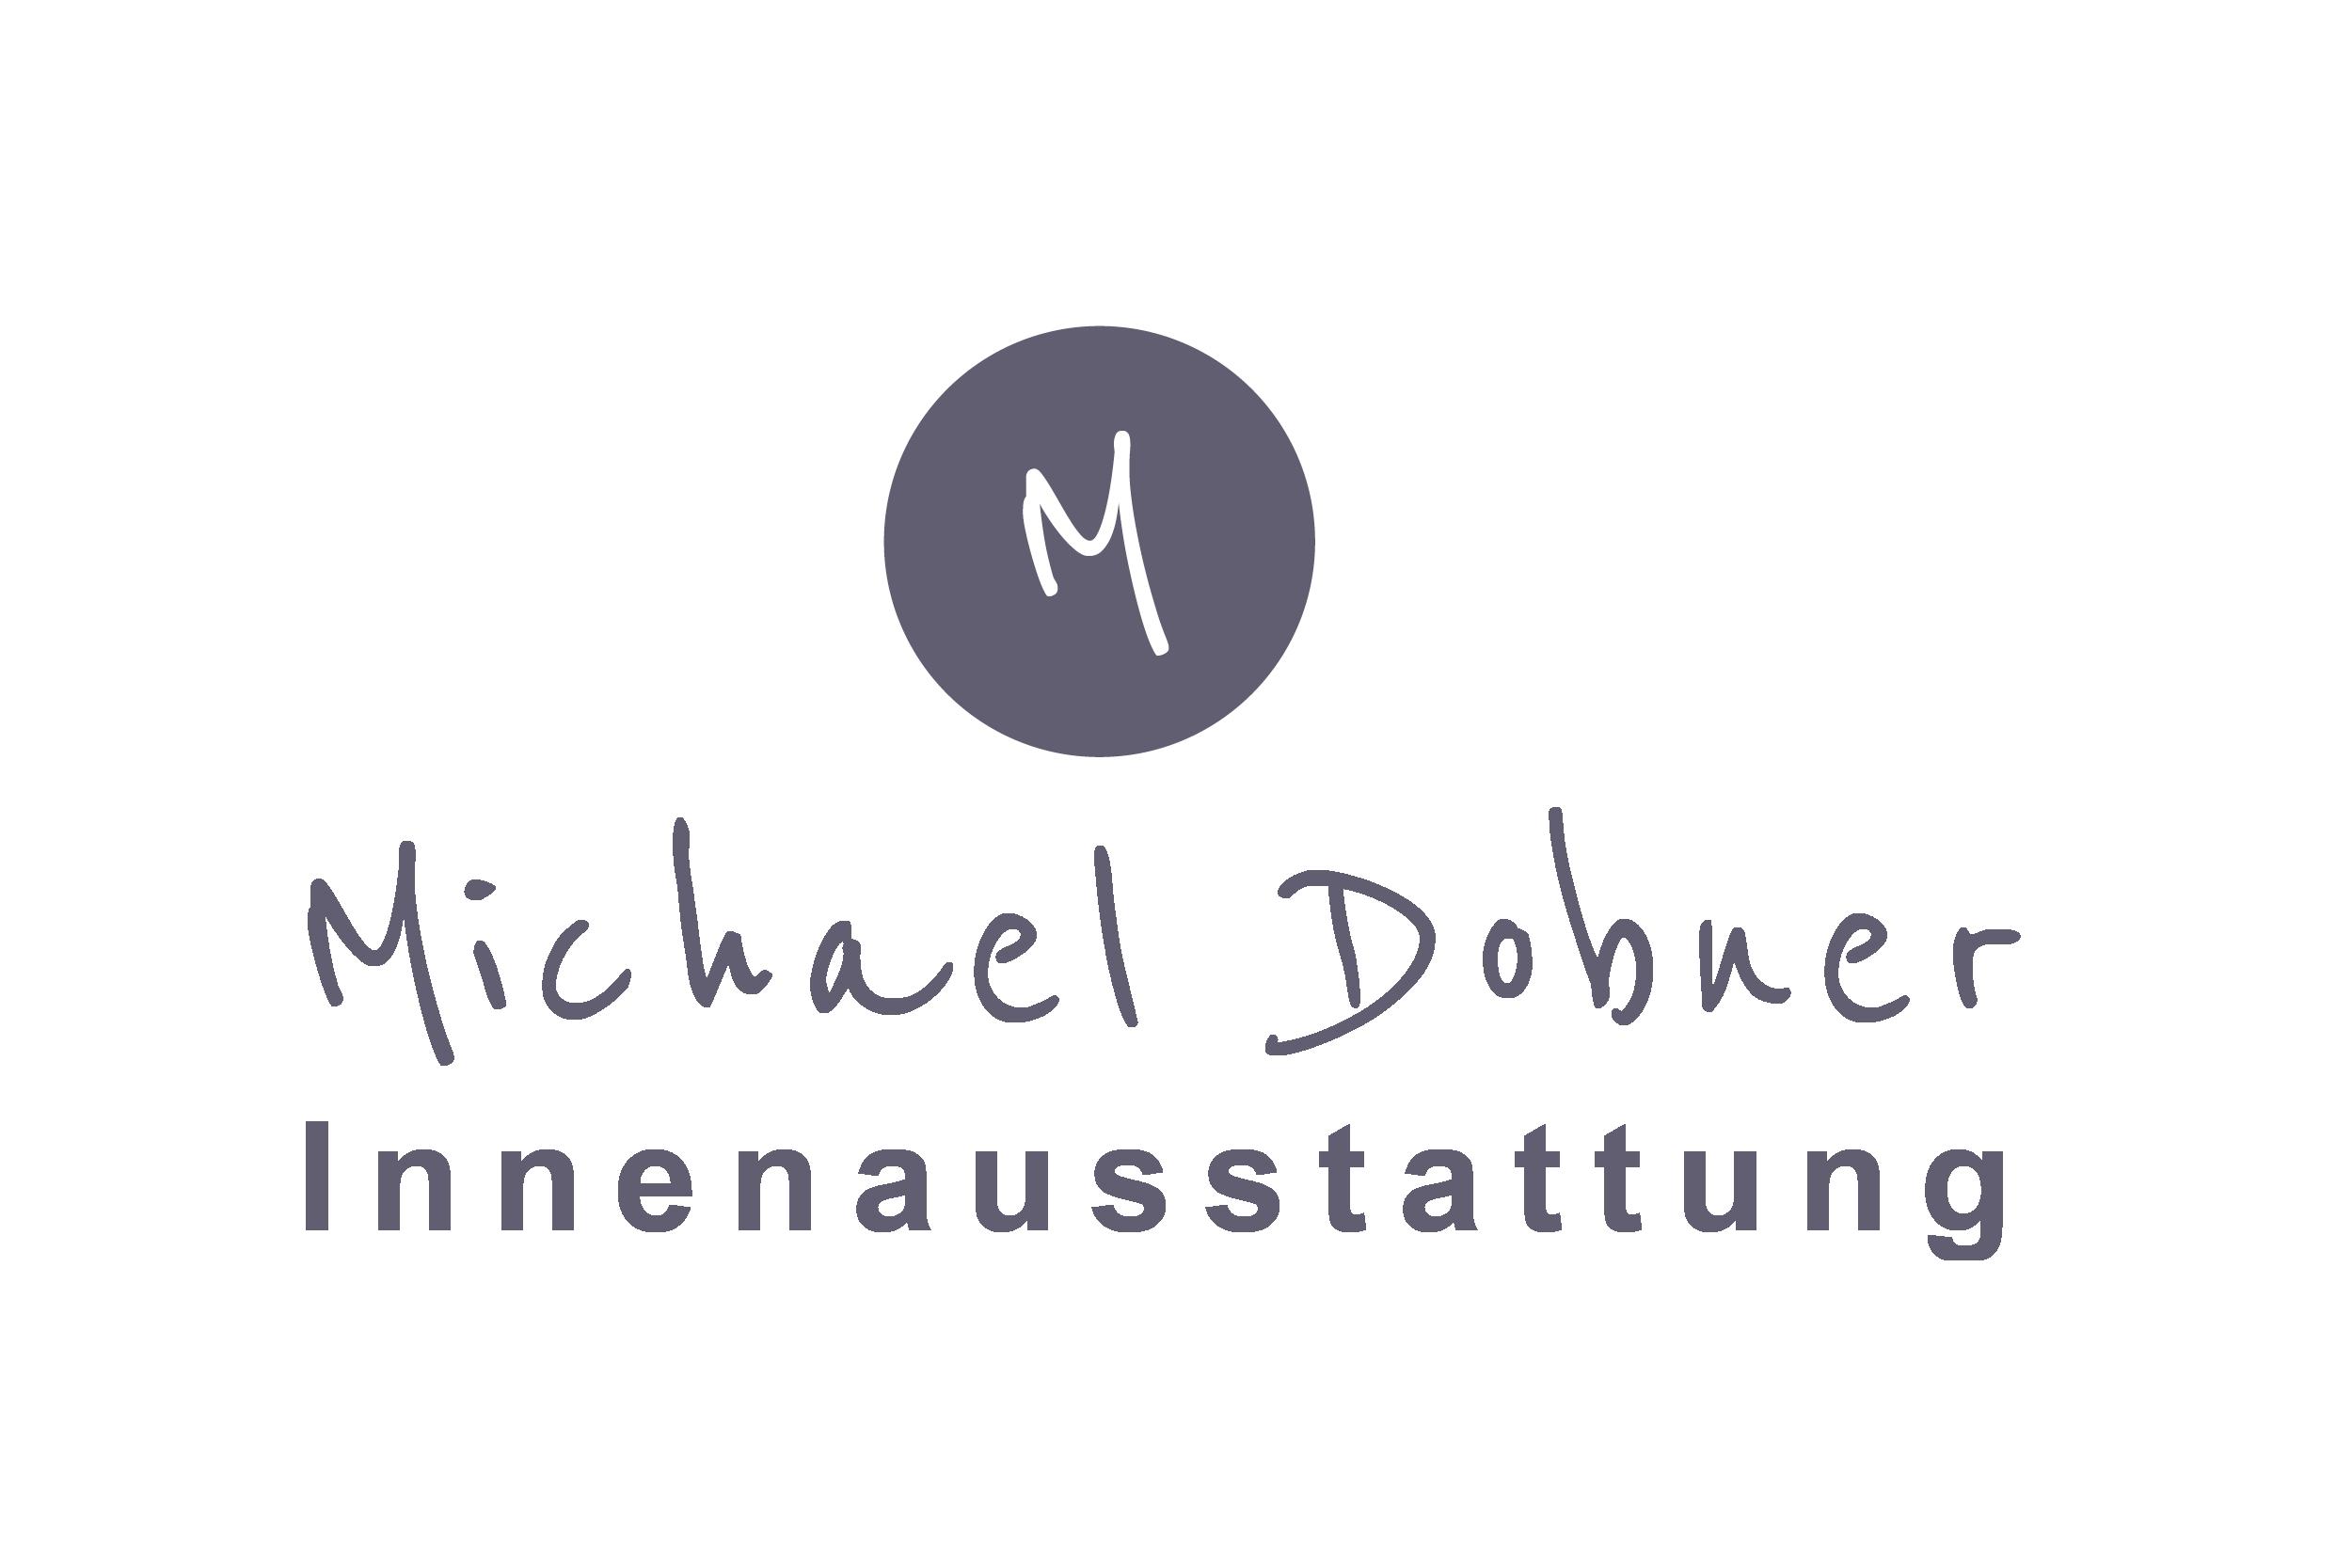 Michael Dobner - Innenausstattung